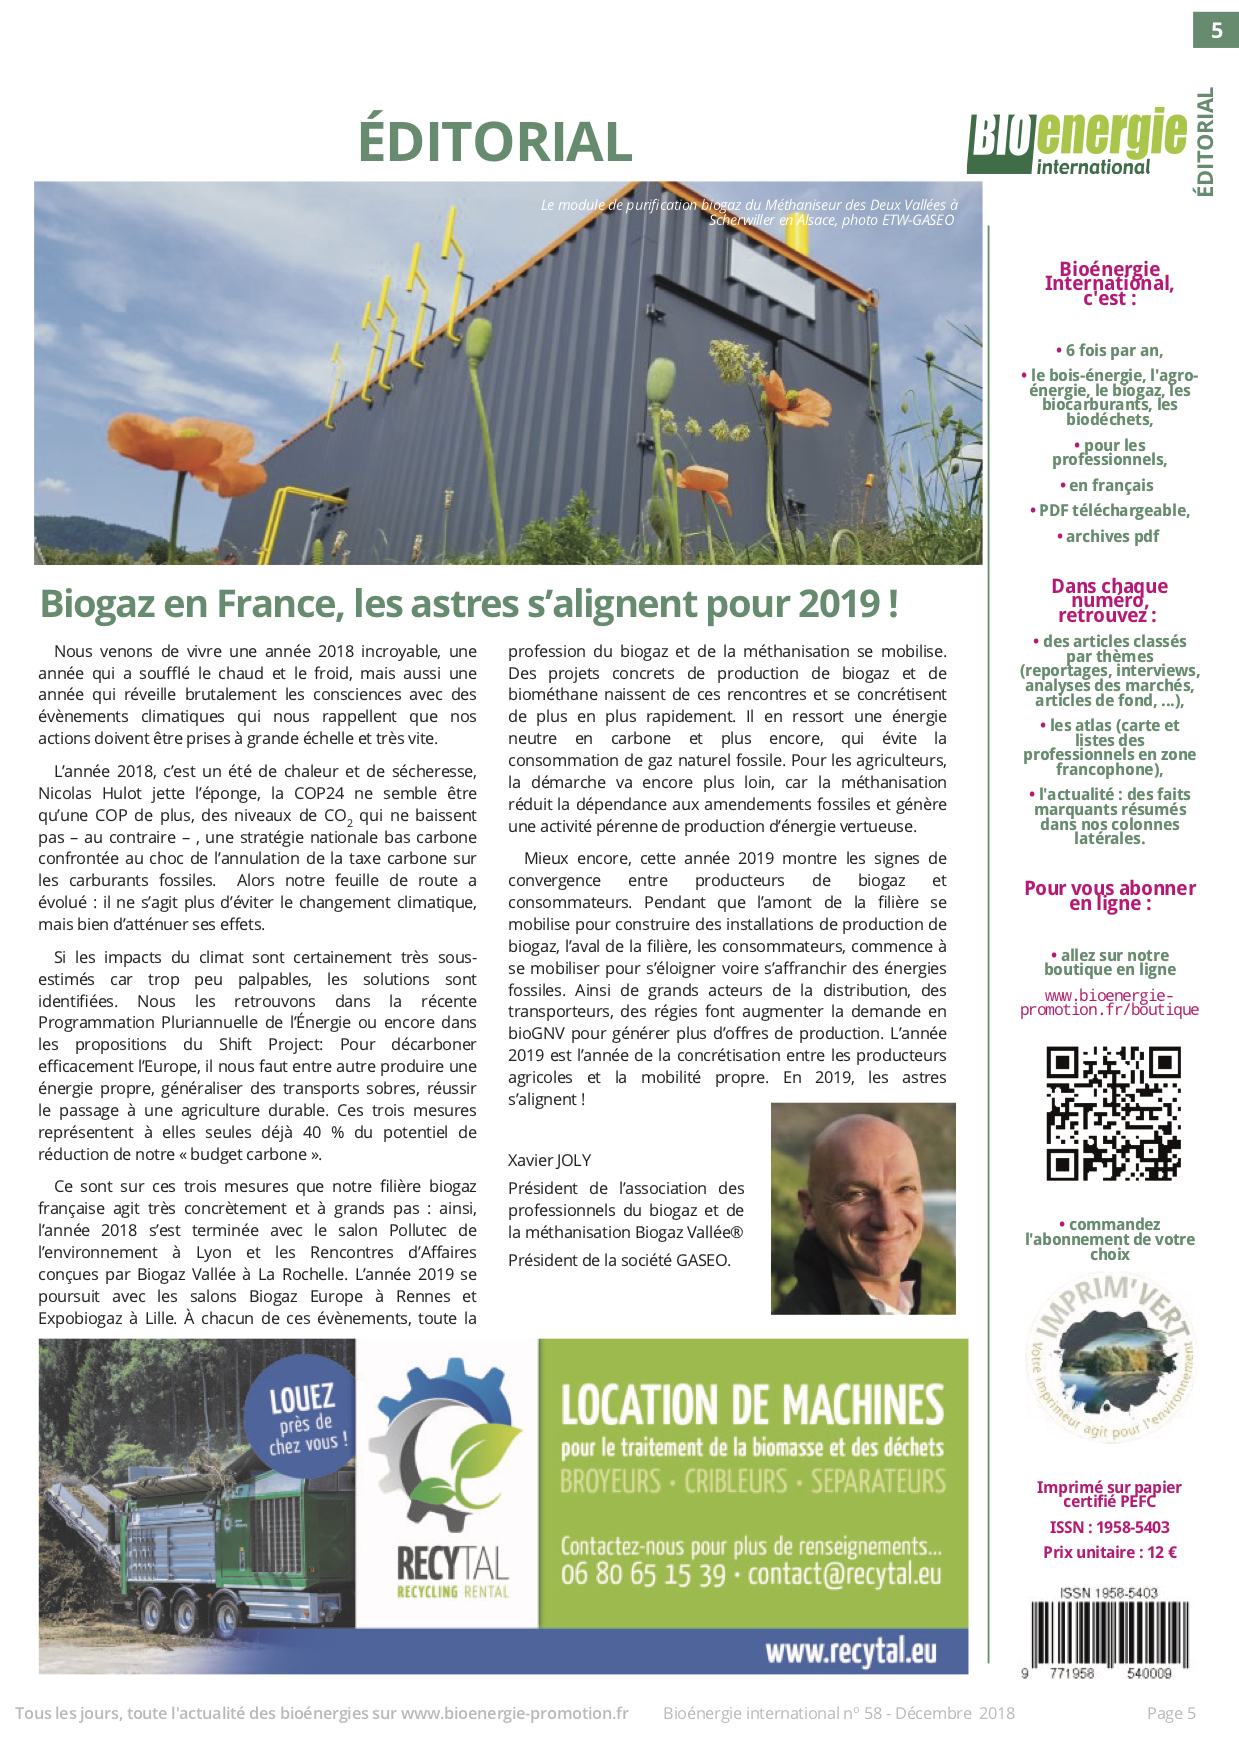 2019-edito-bioenergie-janvier-2019-394